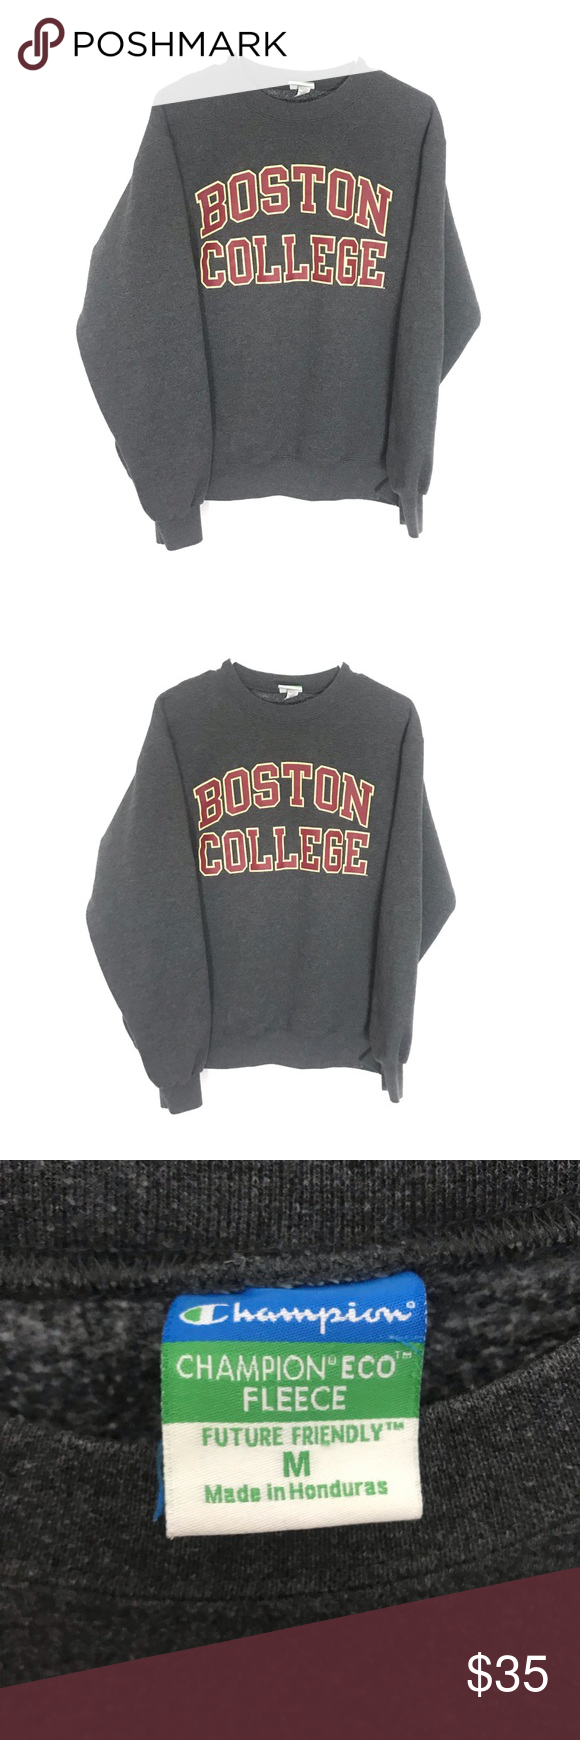 Boston College Crewneck Zara Fashion College Crewneck Sweatshirts Champion Tops [ 1740 x 580 Pixel ]